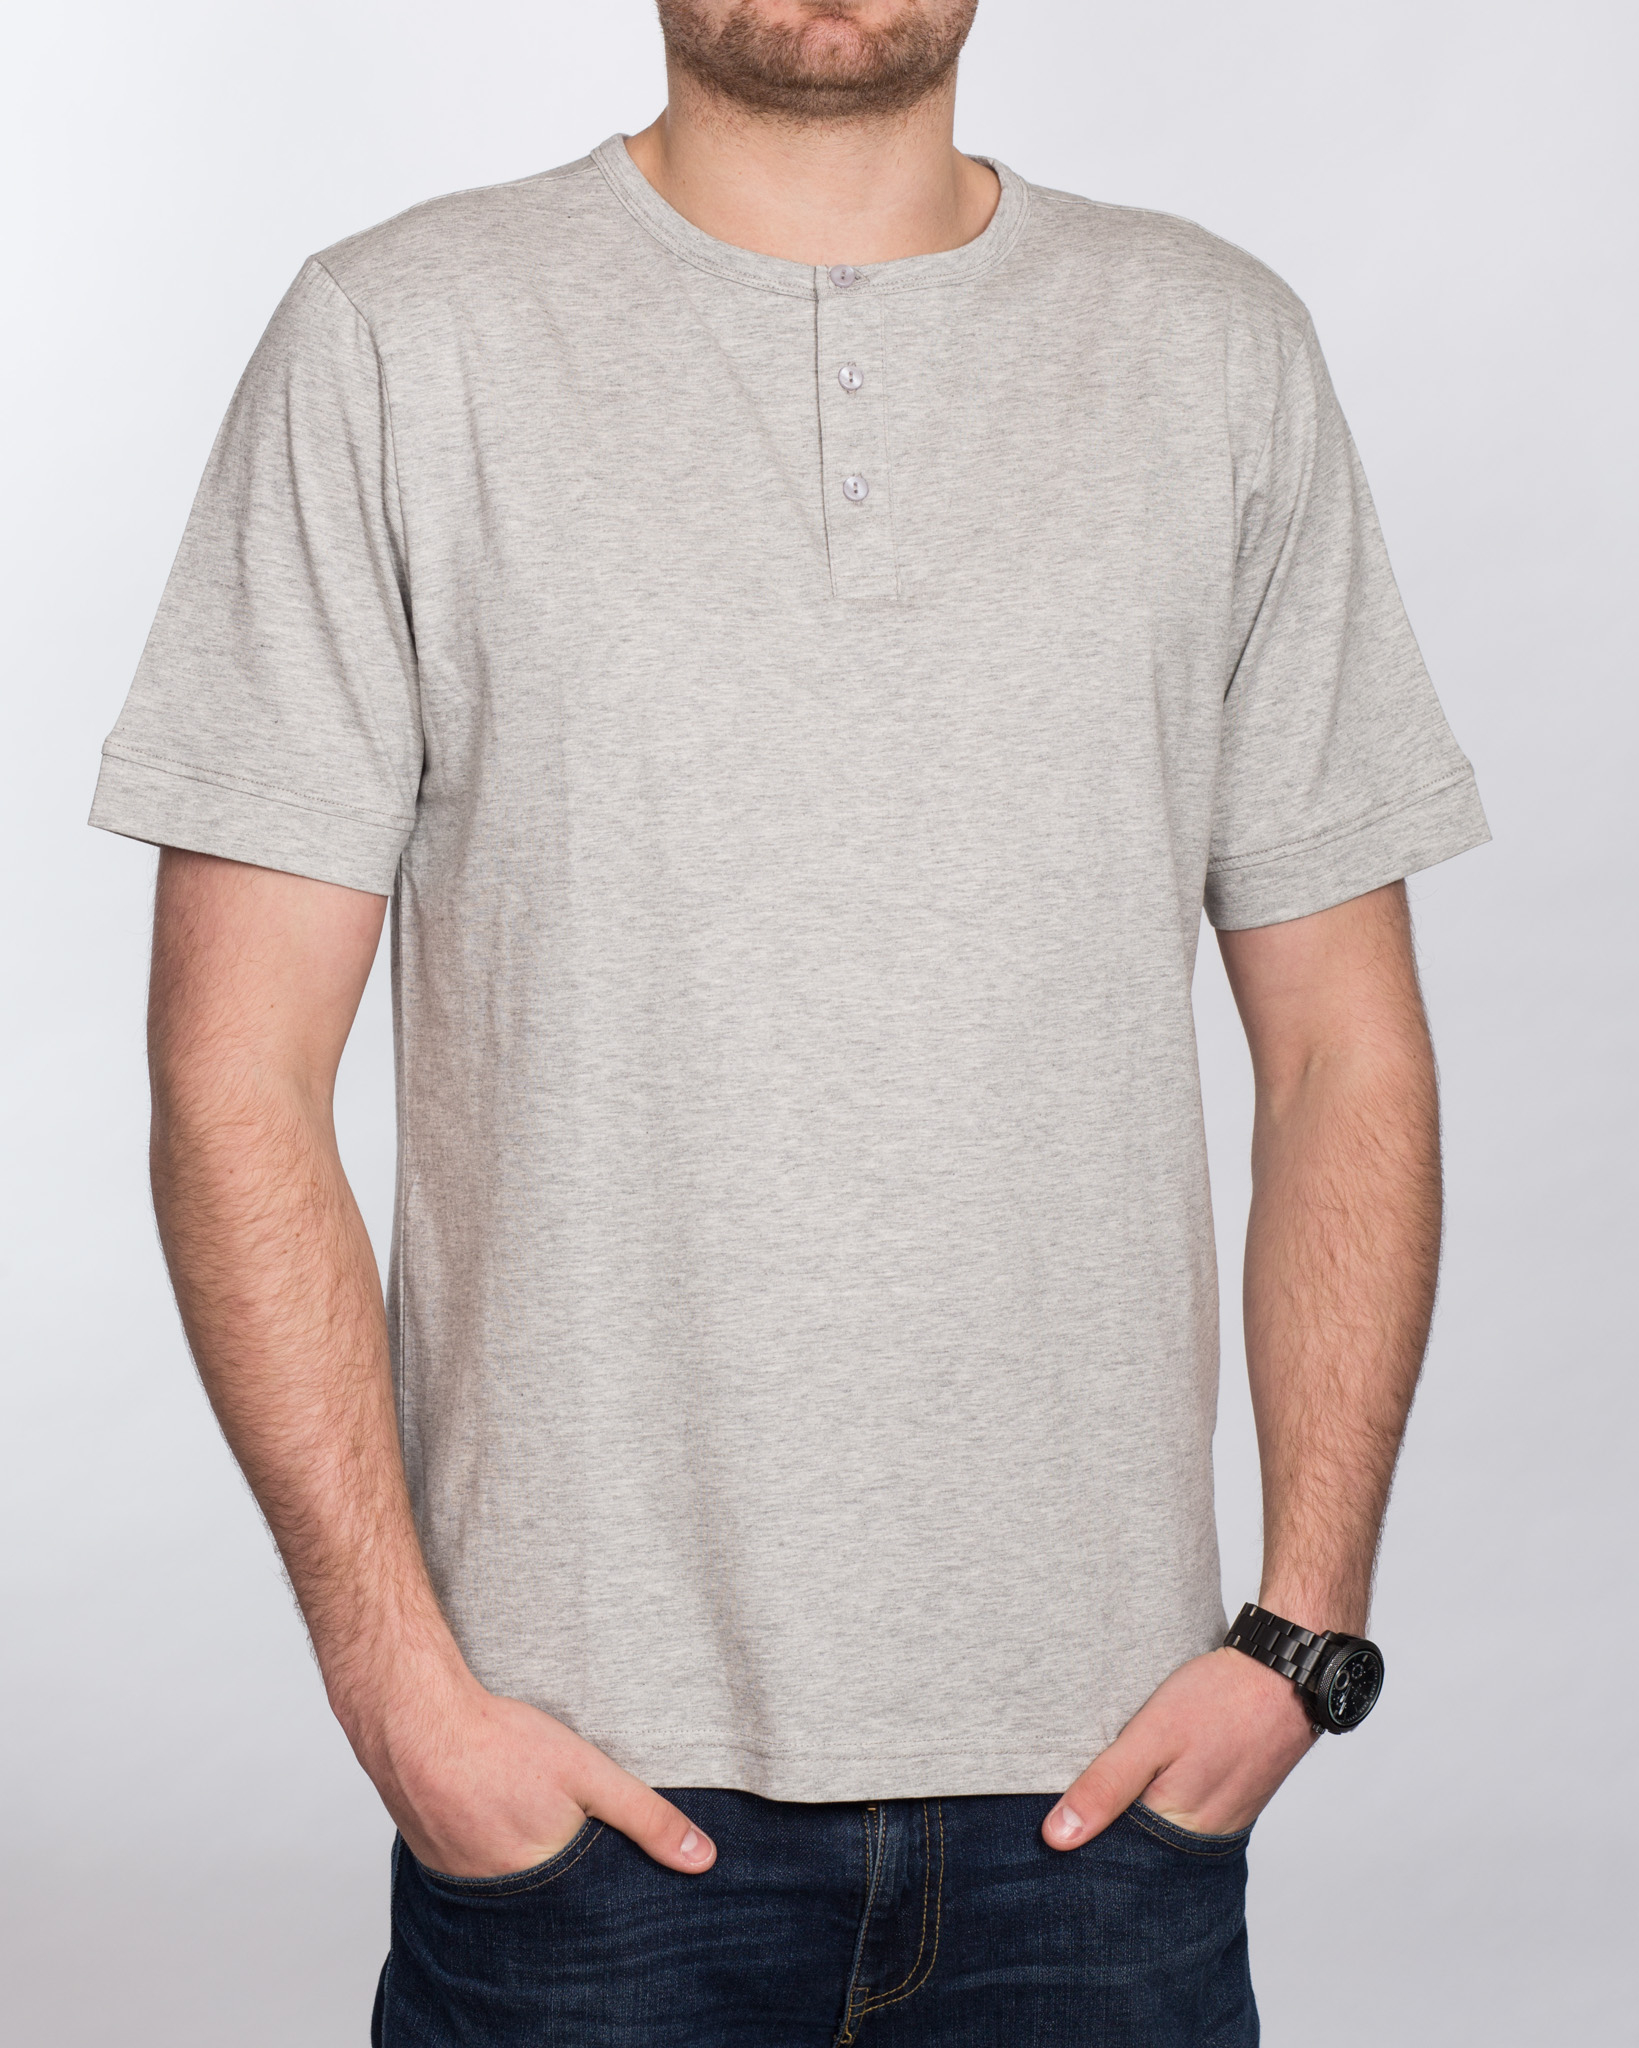 Replica Grandad Shirt (heather grey)